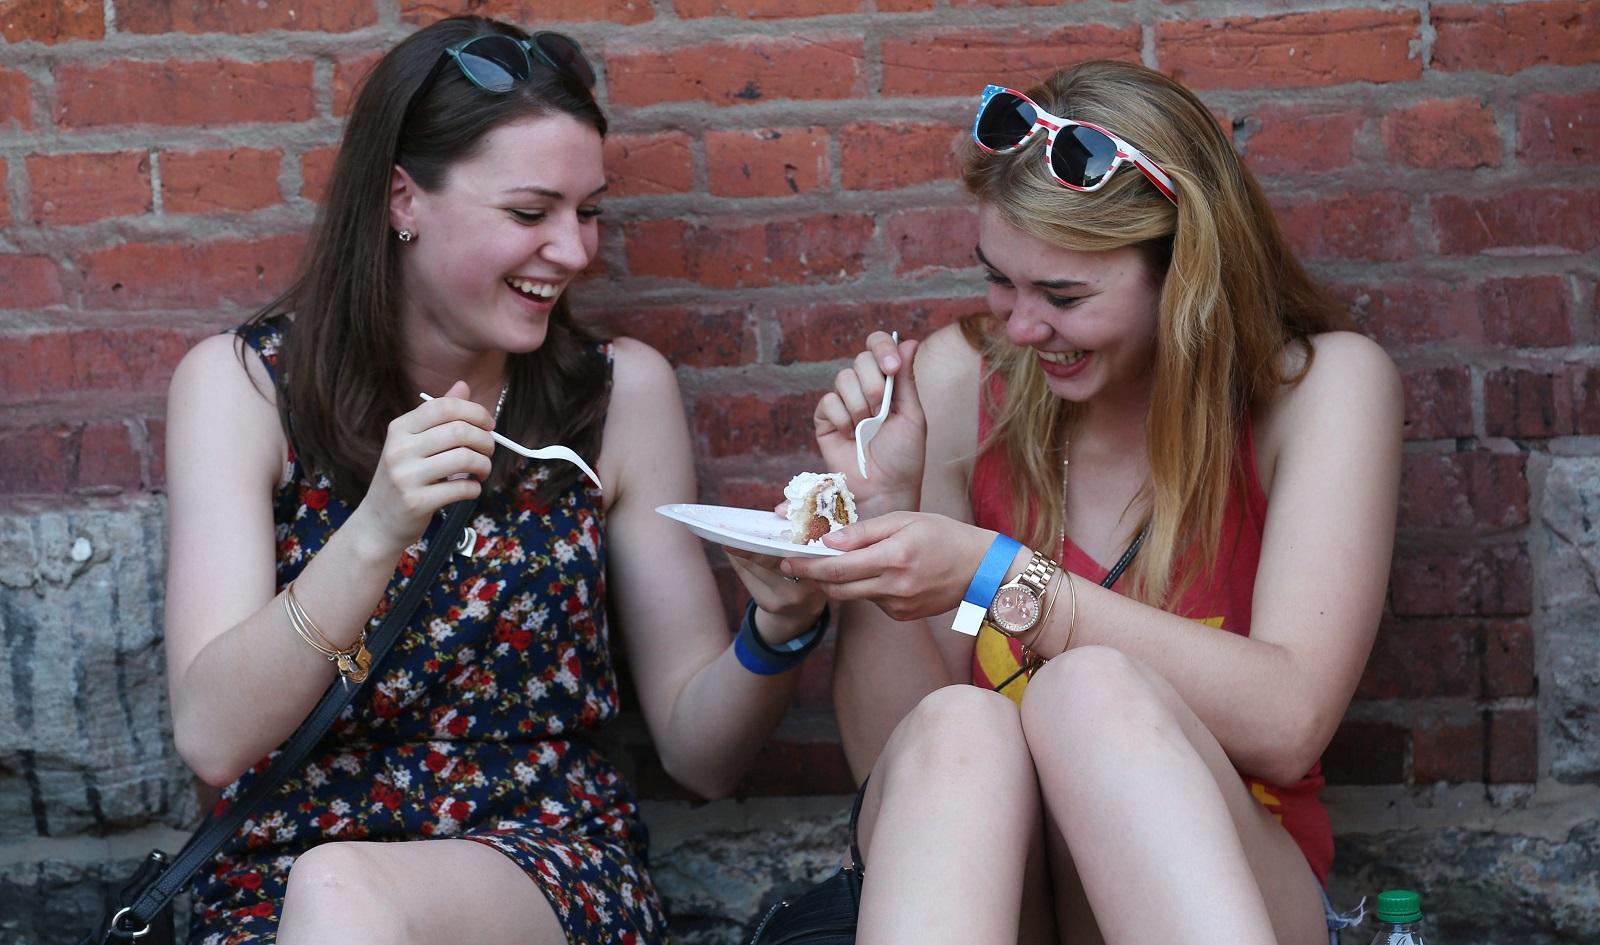 Lauren Orynawka, left, of Elma and Leanne Schad of Cheektowaga, share a strawberry shortcake from The Sweet Hearth. (Sharon Cantillon/Buffalo News file photo